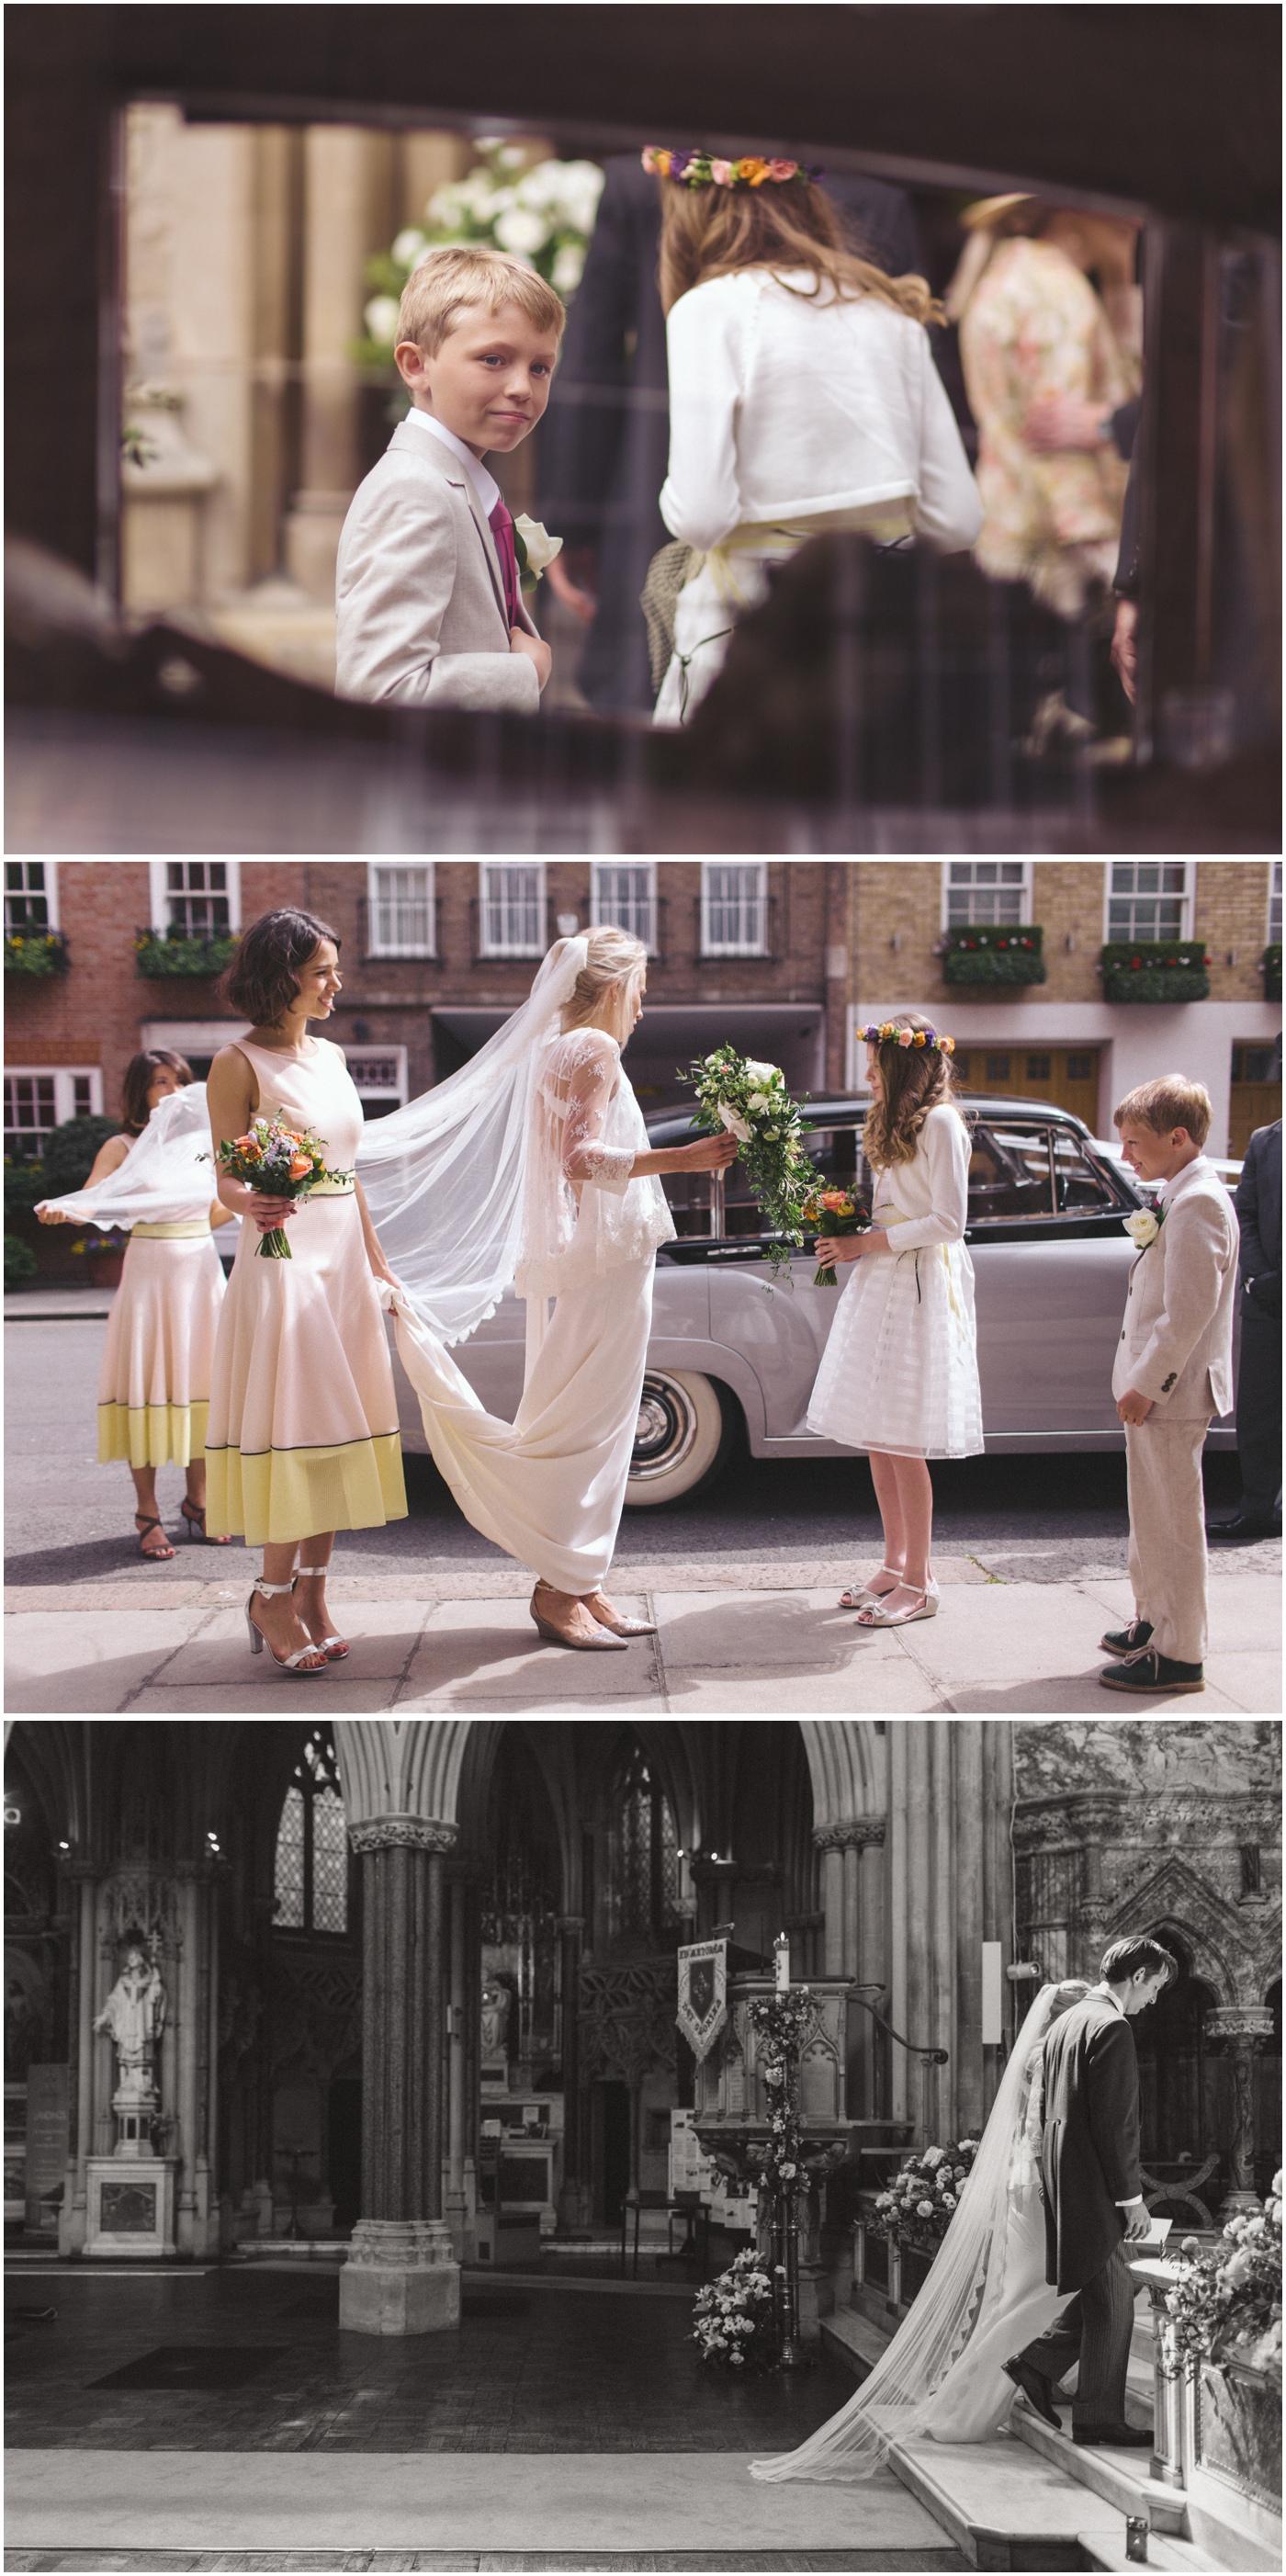 Mary & Rupert 9.jpg